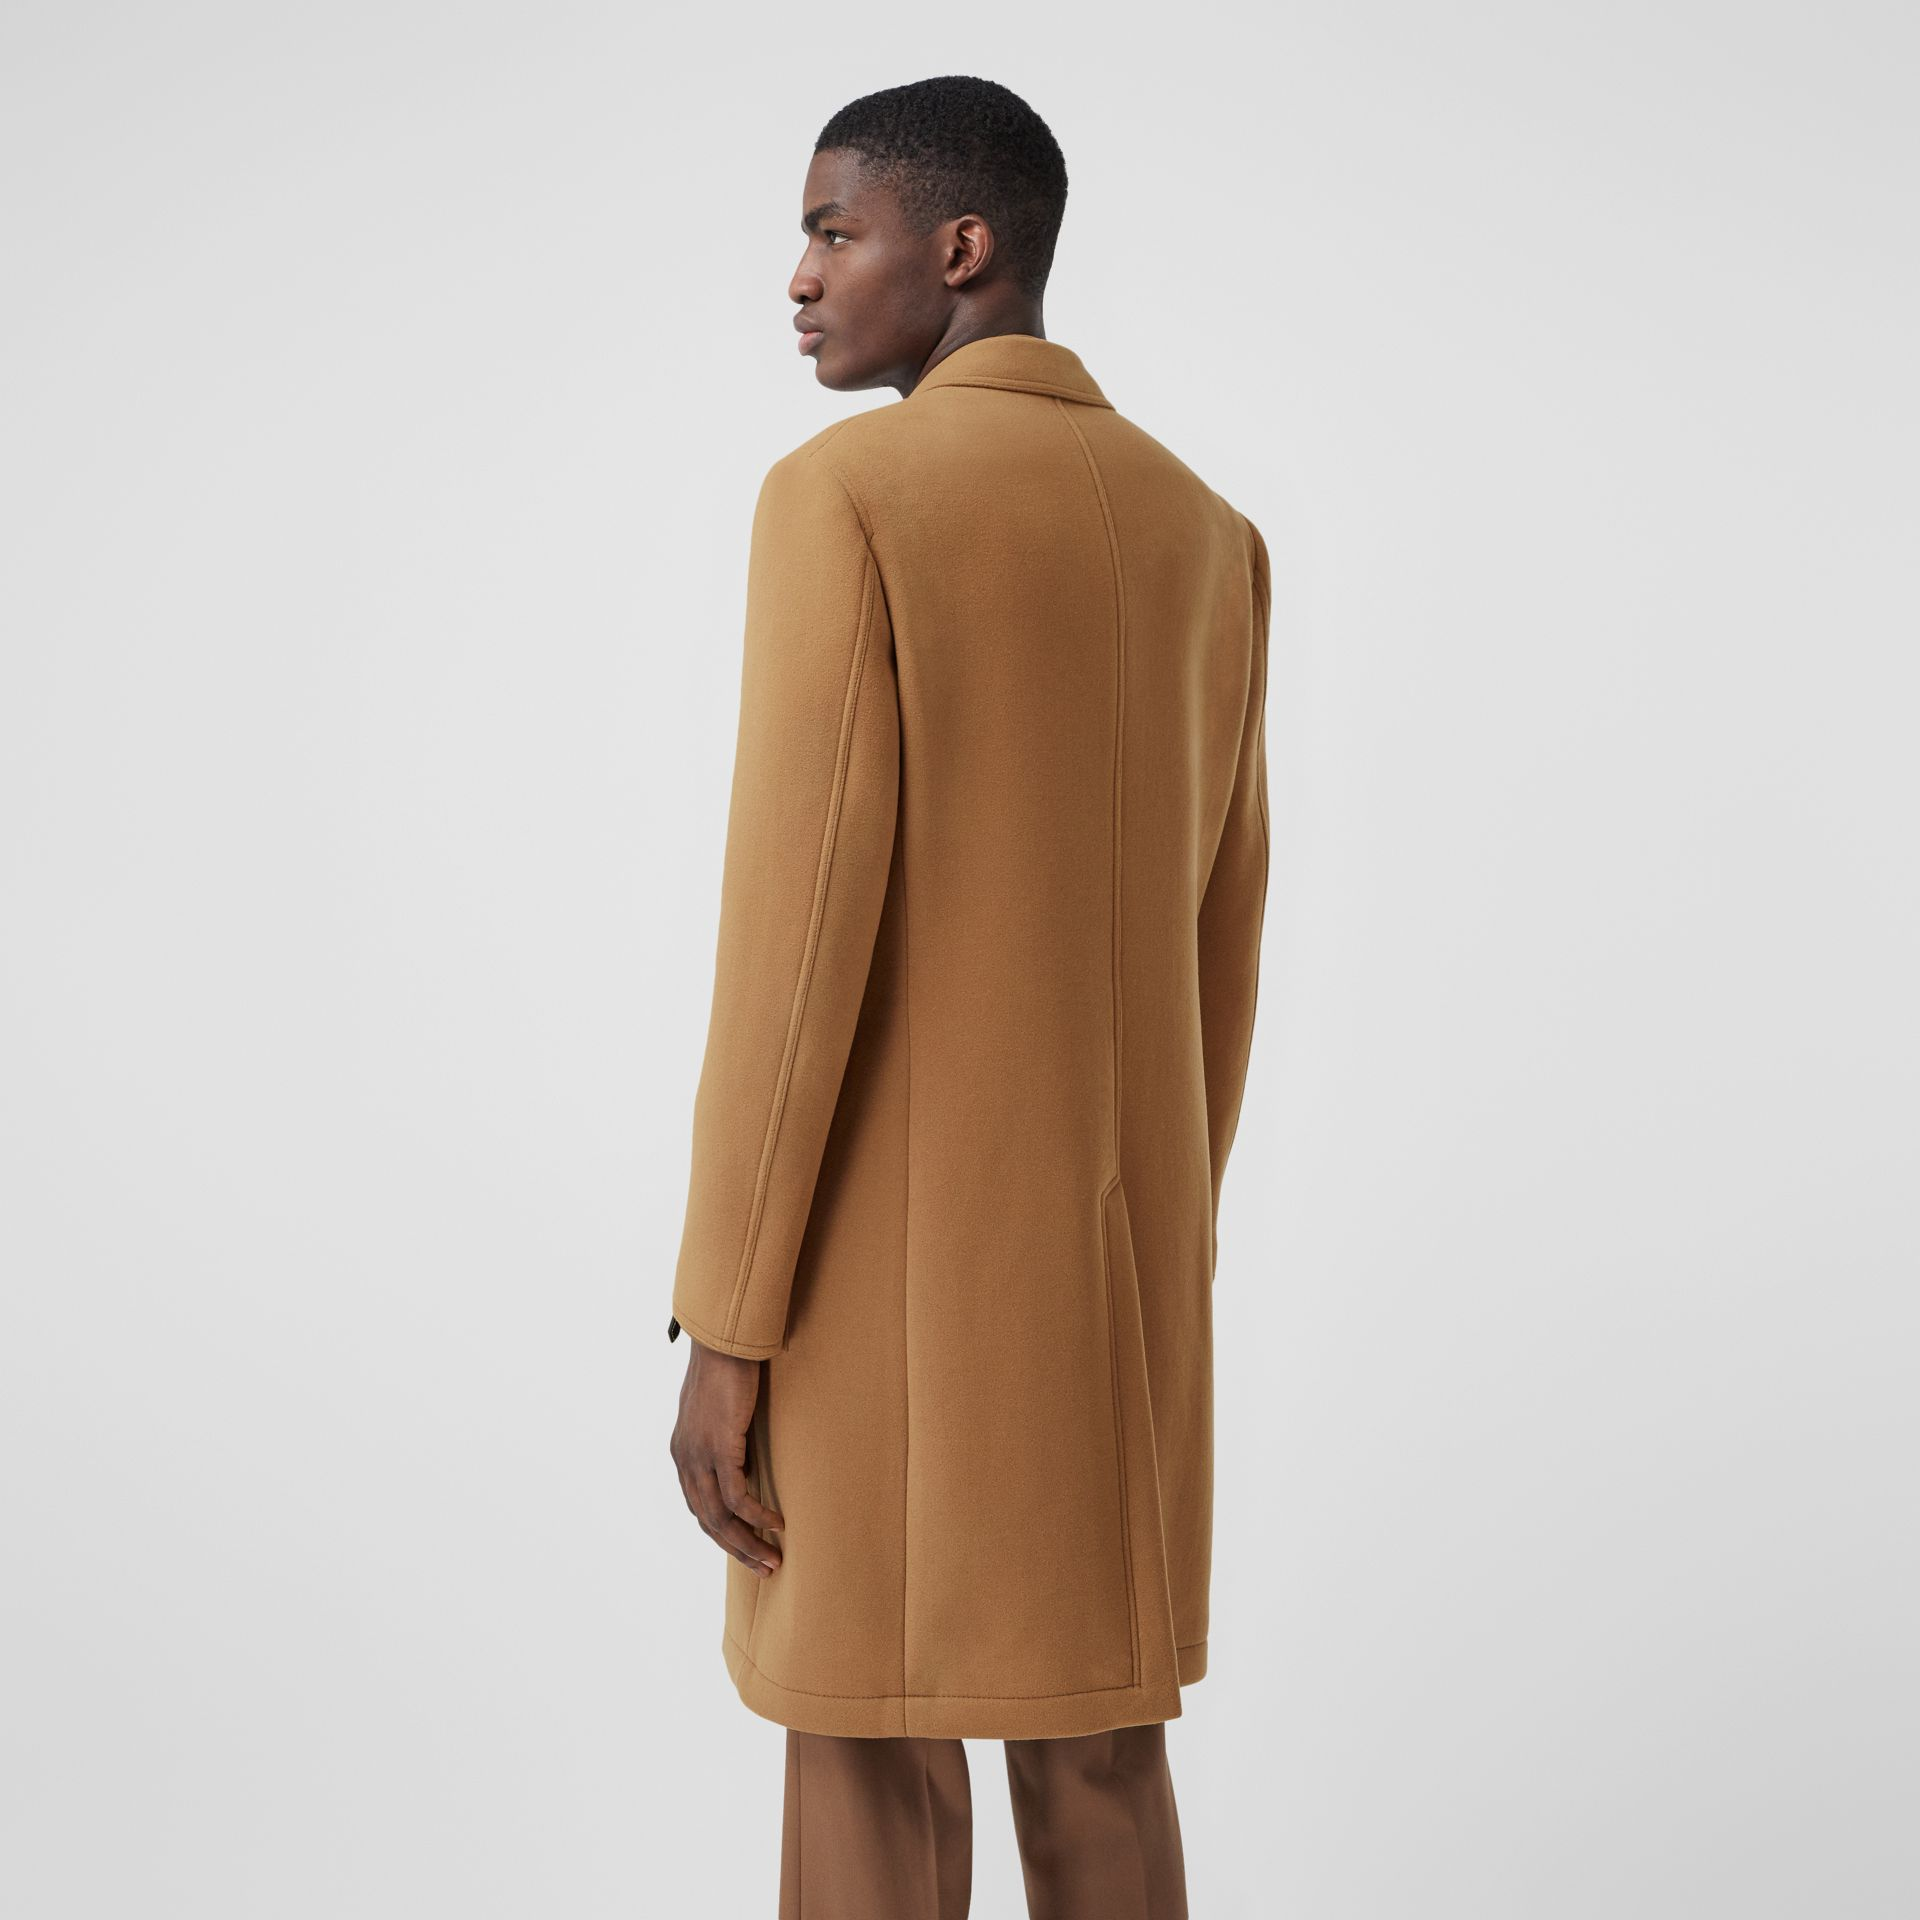 Zip Detail Wool Tailored Coat in Warm Camel - Men | Burberry - gallery image 2